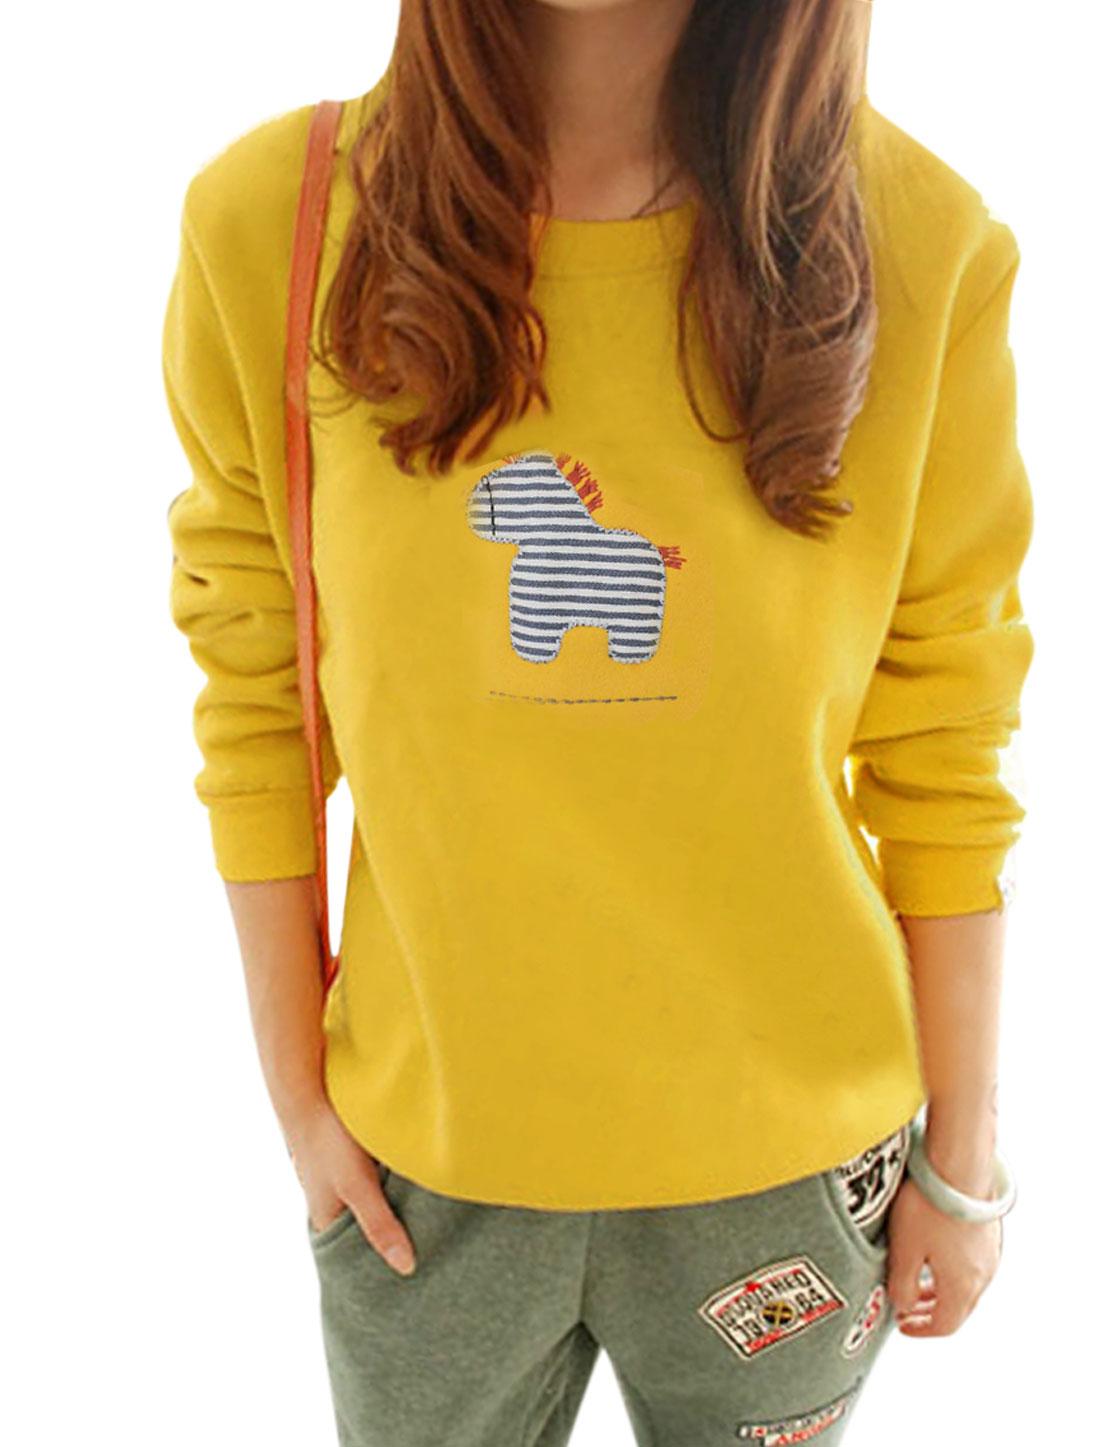 Lady Round Neck Zebra Applique Fashionable Casual Top Yellow XS